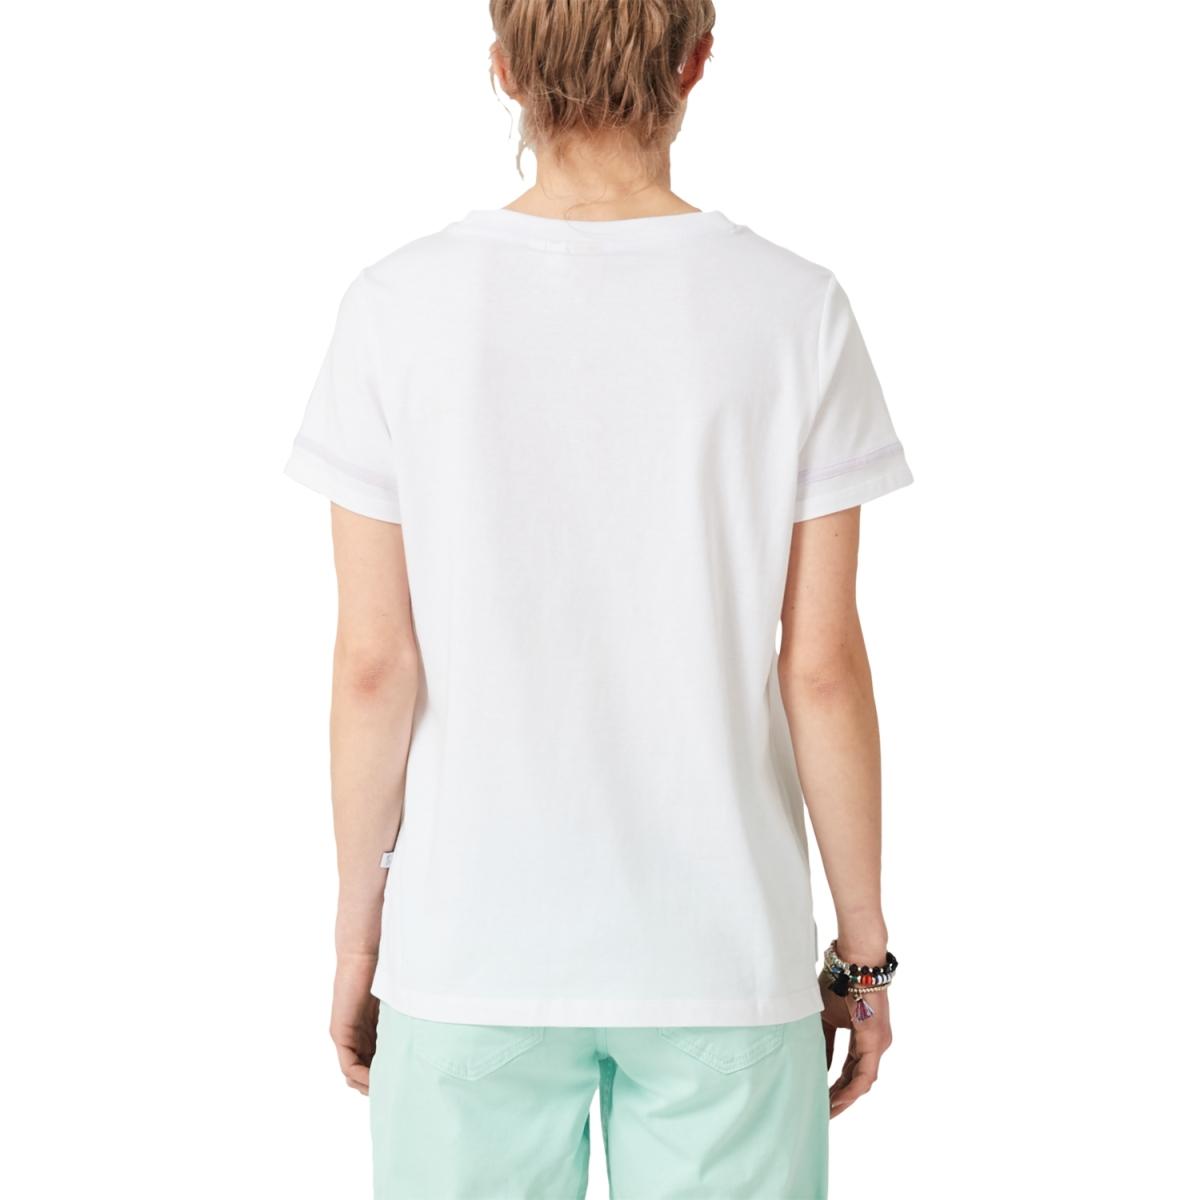 sportief shirt met glinsterende tekst 41905325284 q/s designed by t-shirt 01d0